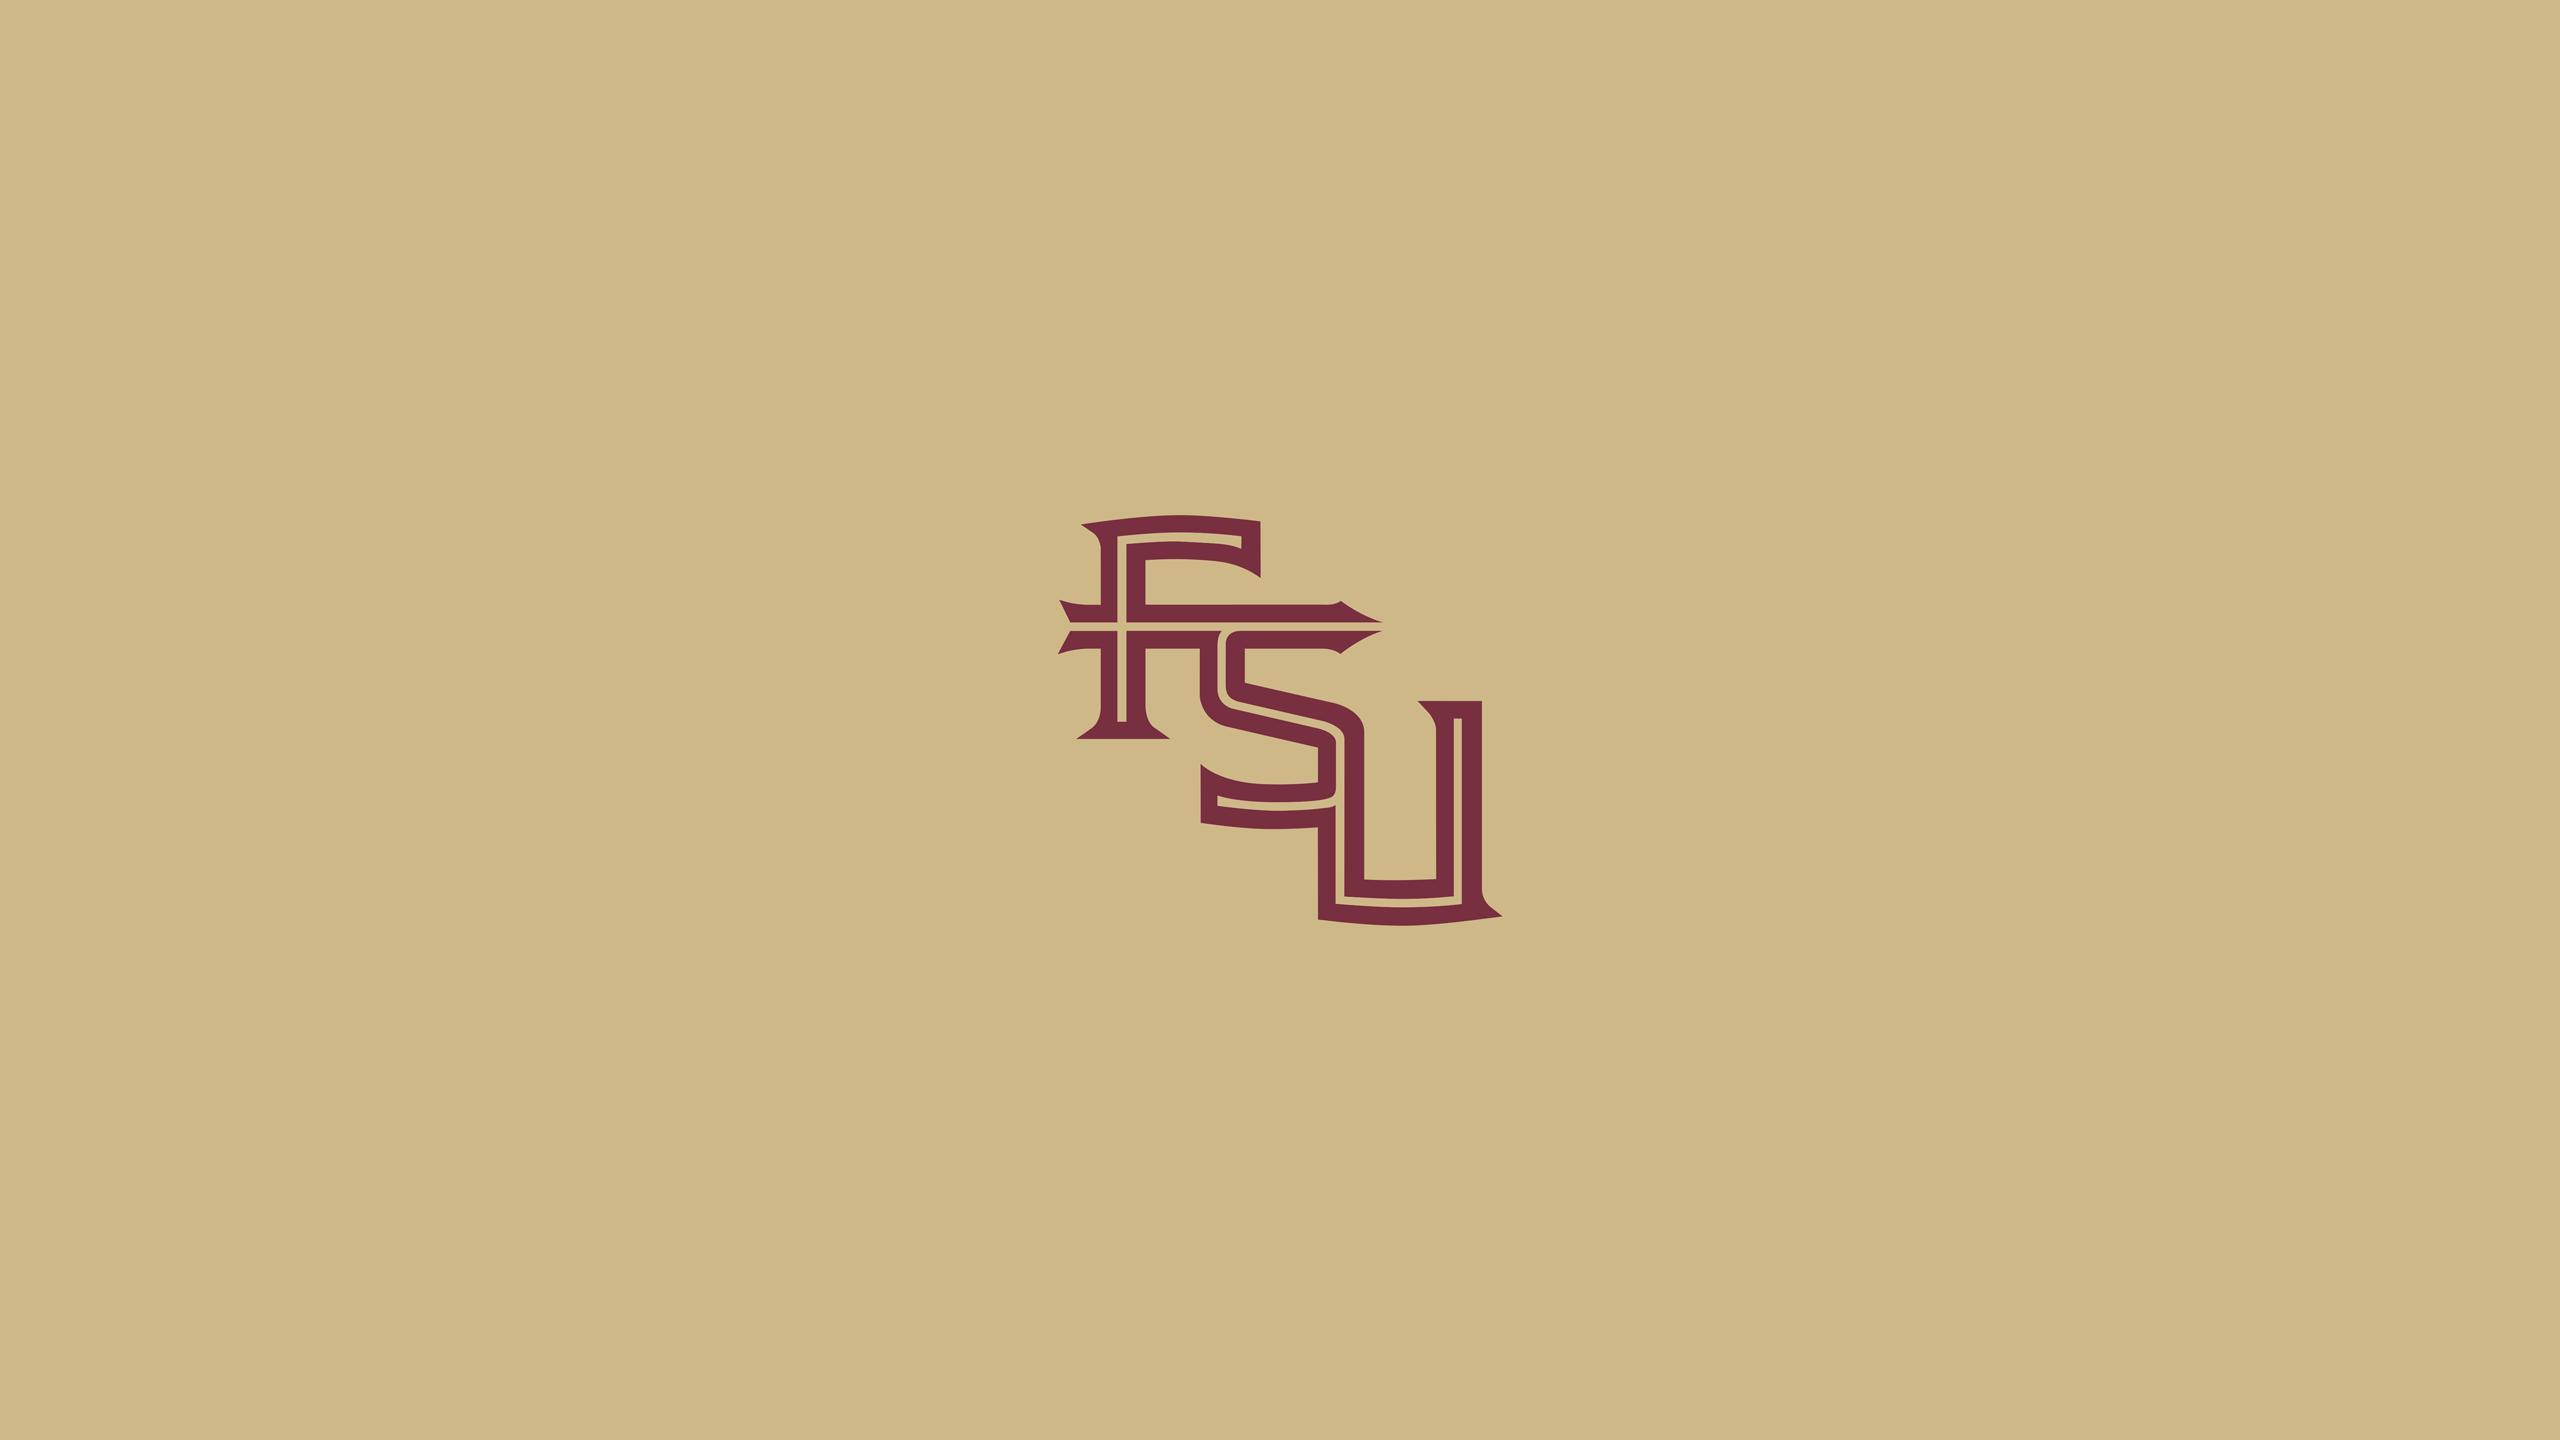 Florida State University Seminoles